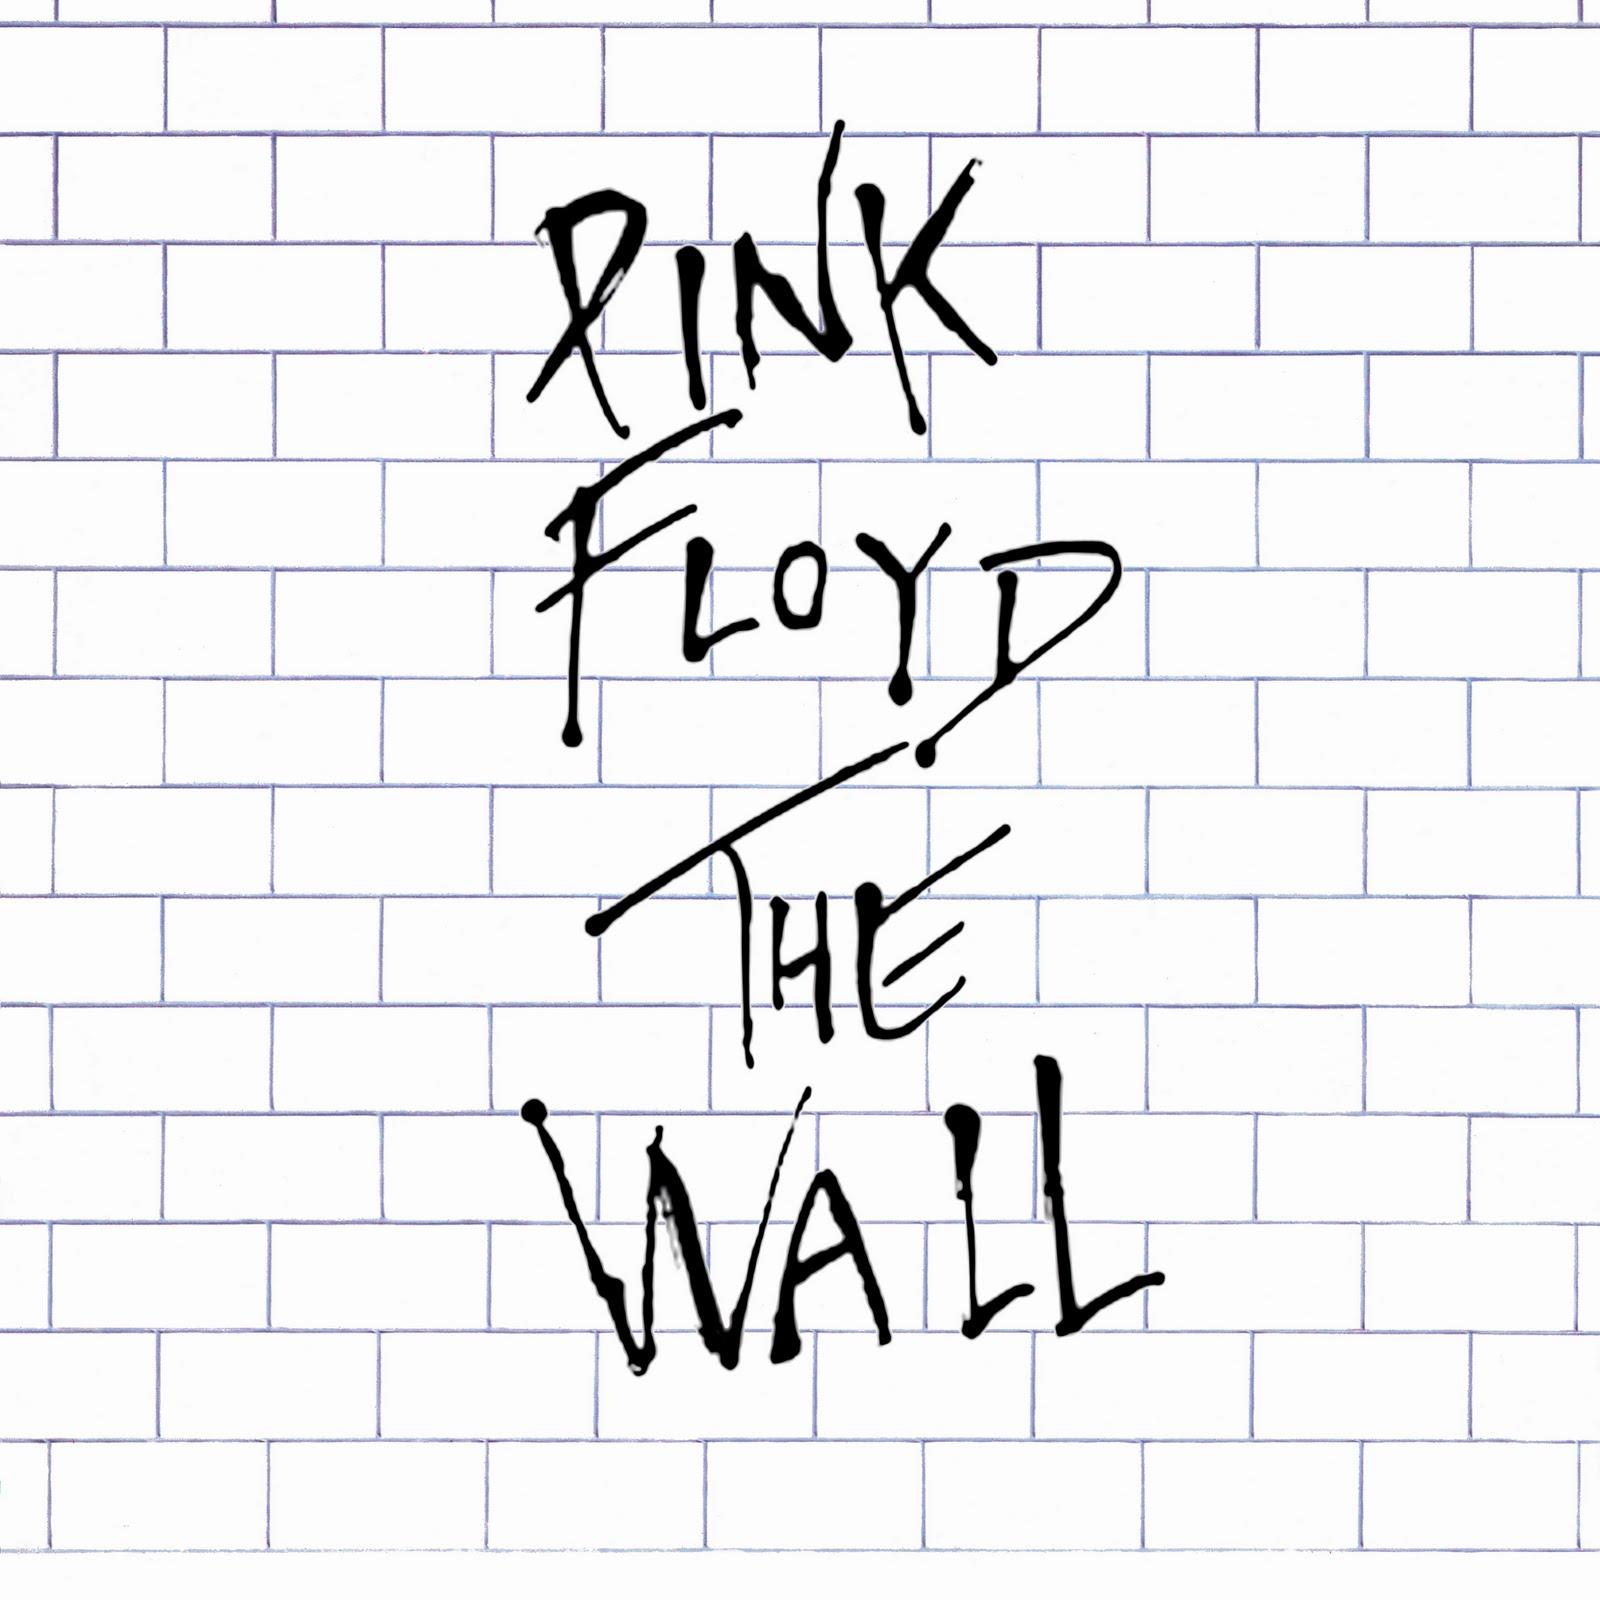 Pink Floyd The Wall Album Cover Art Pinterest